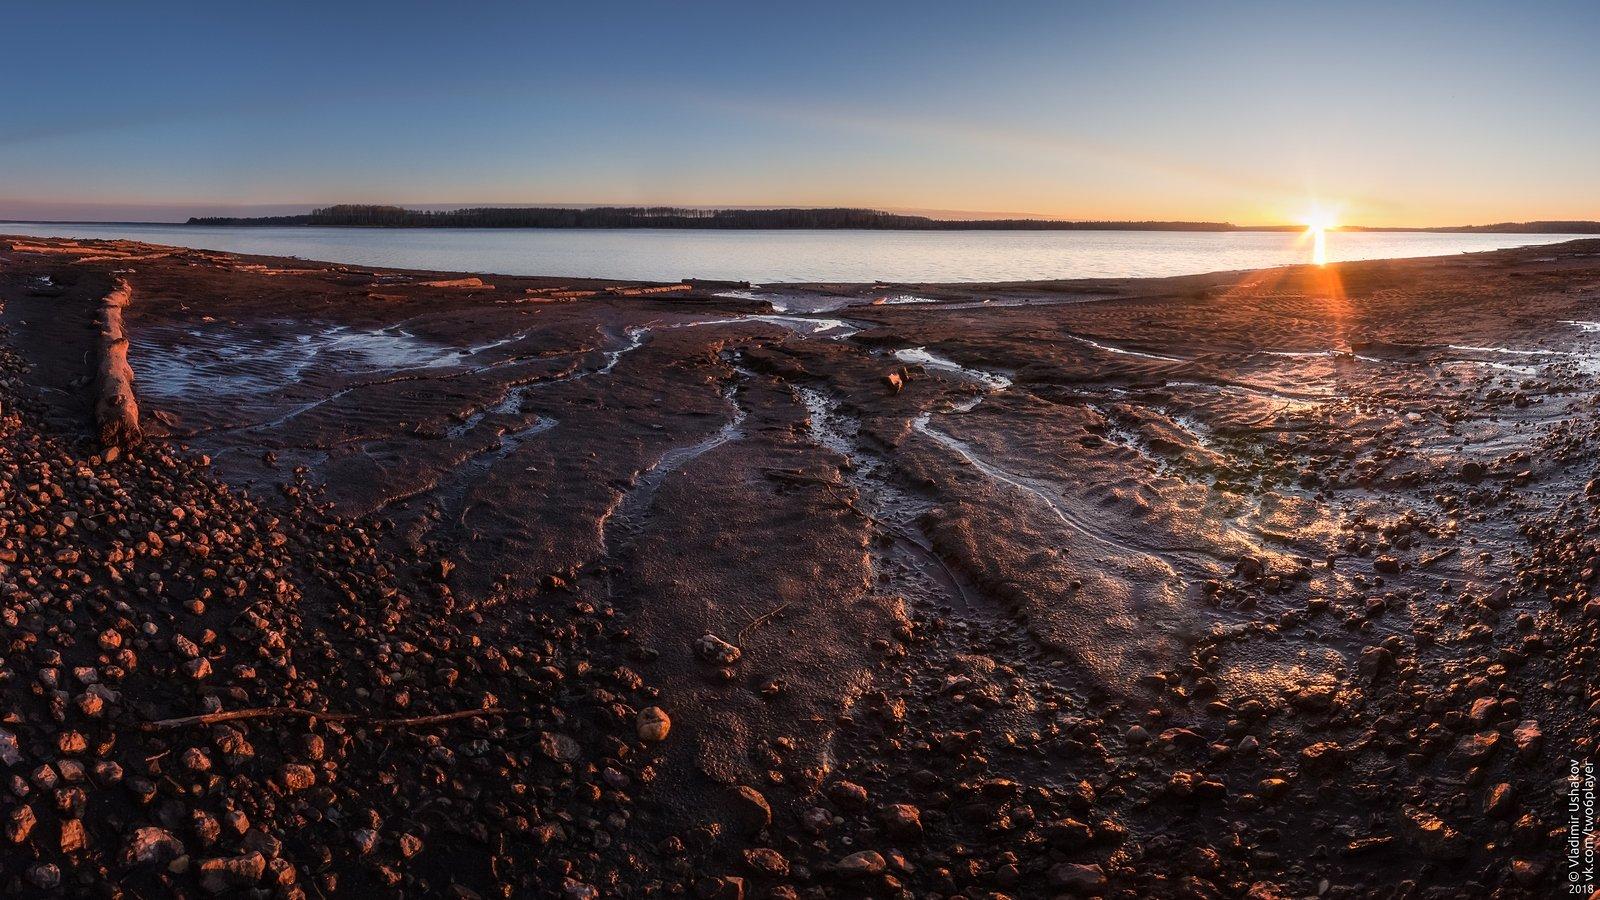 закат, солнце, вечер, берег, залив, кондас, пешково, пермский край, Владимир Ушаков